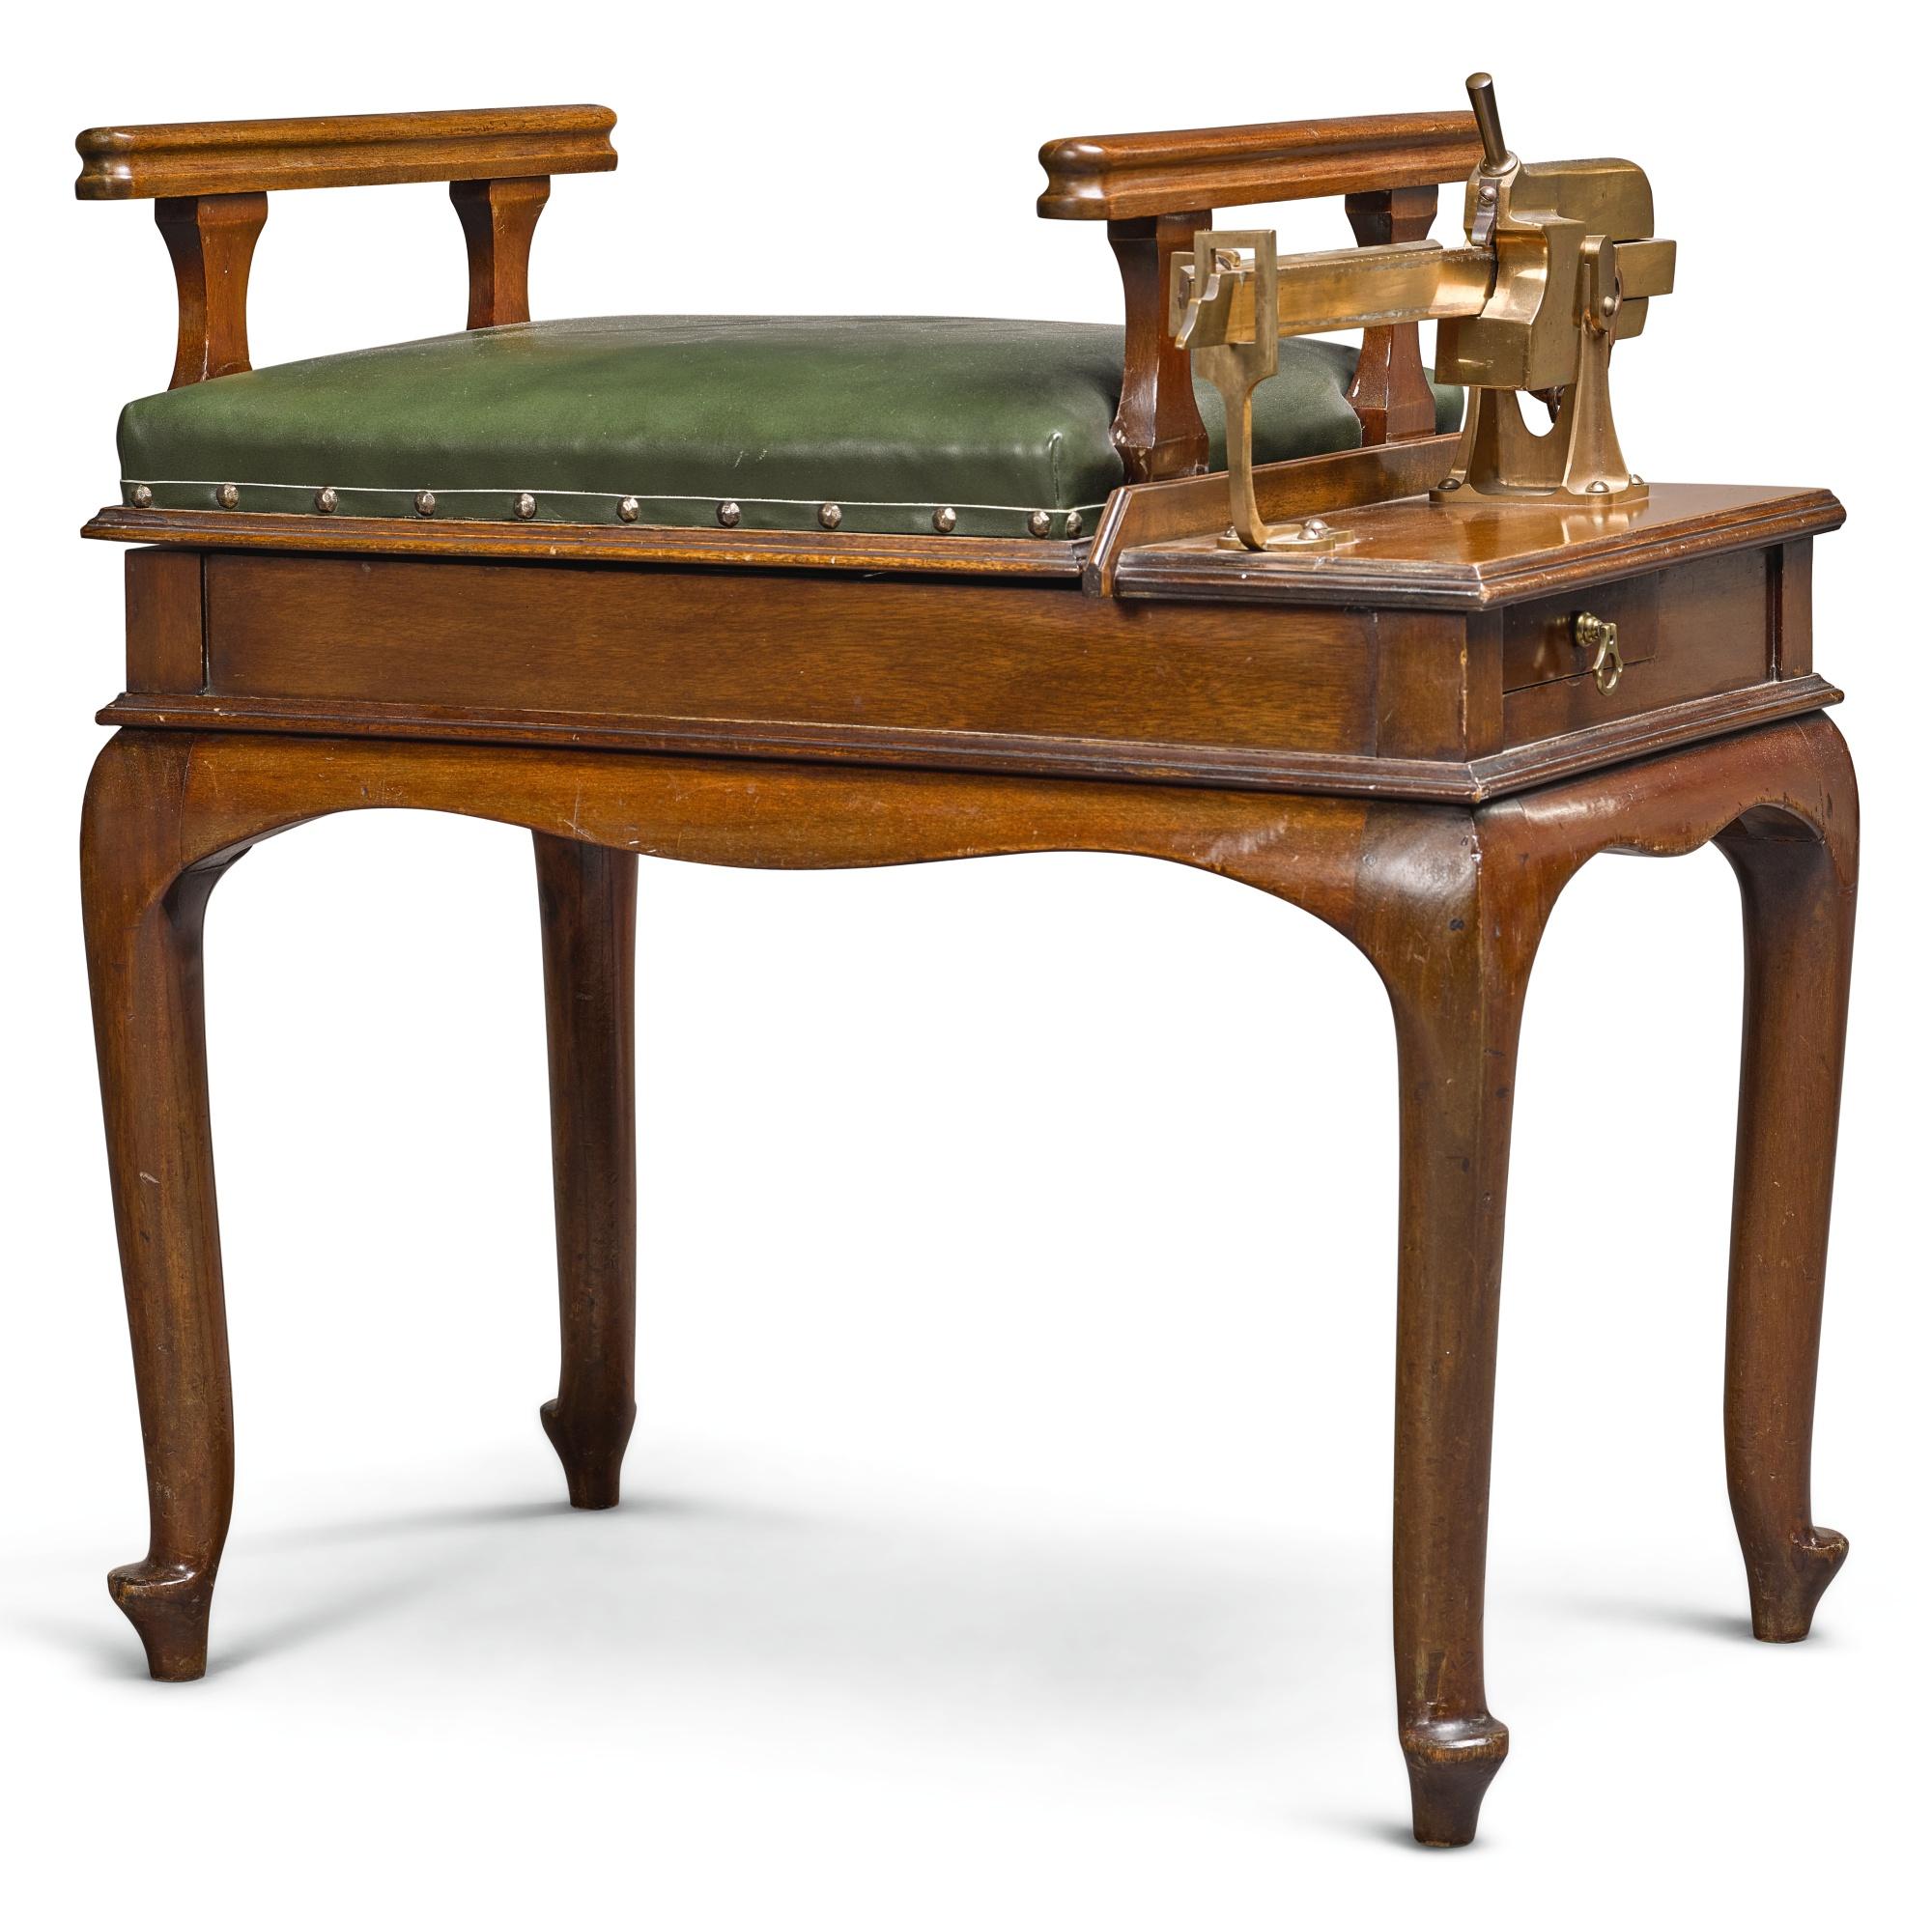 A GEORGE V 'CARLTON' WEIGHING MACHINE BY W & T AVERY LTD, CIRCA 1915